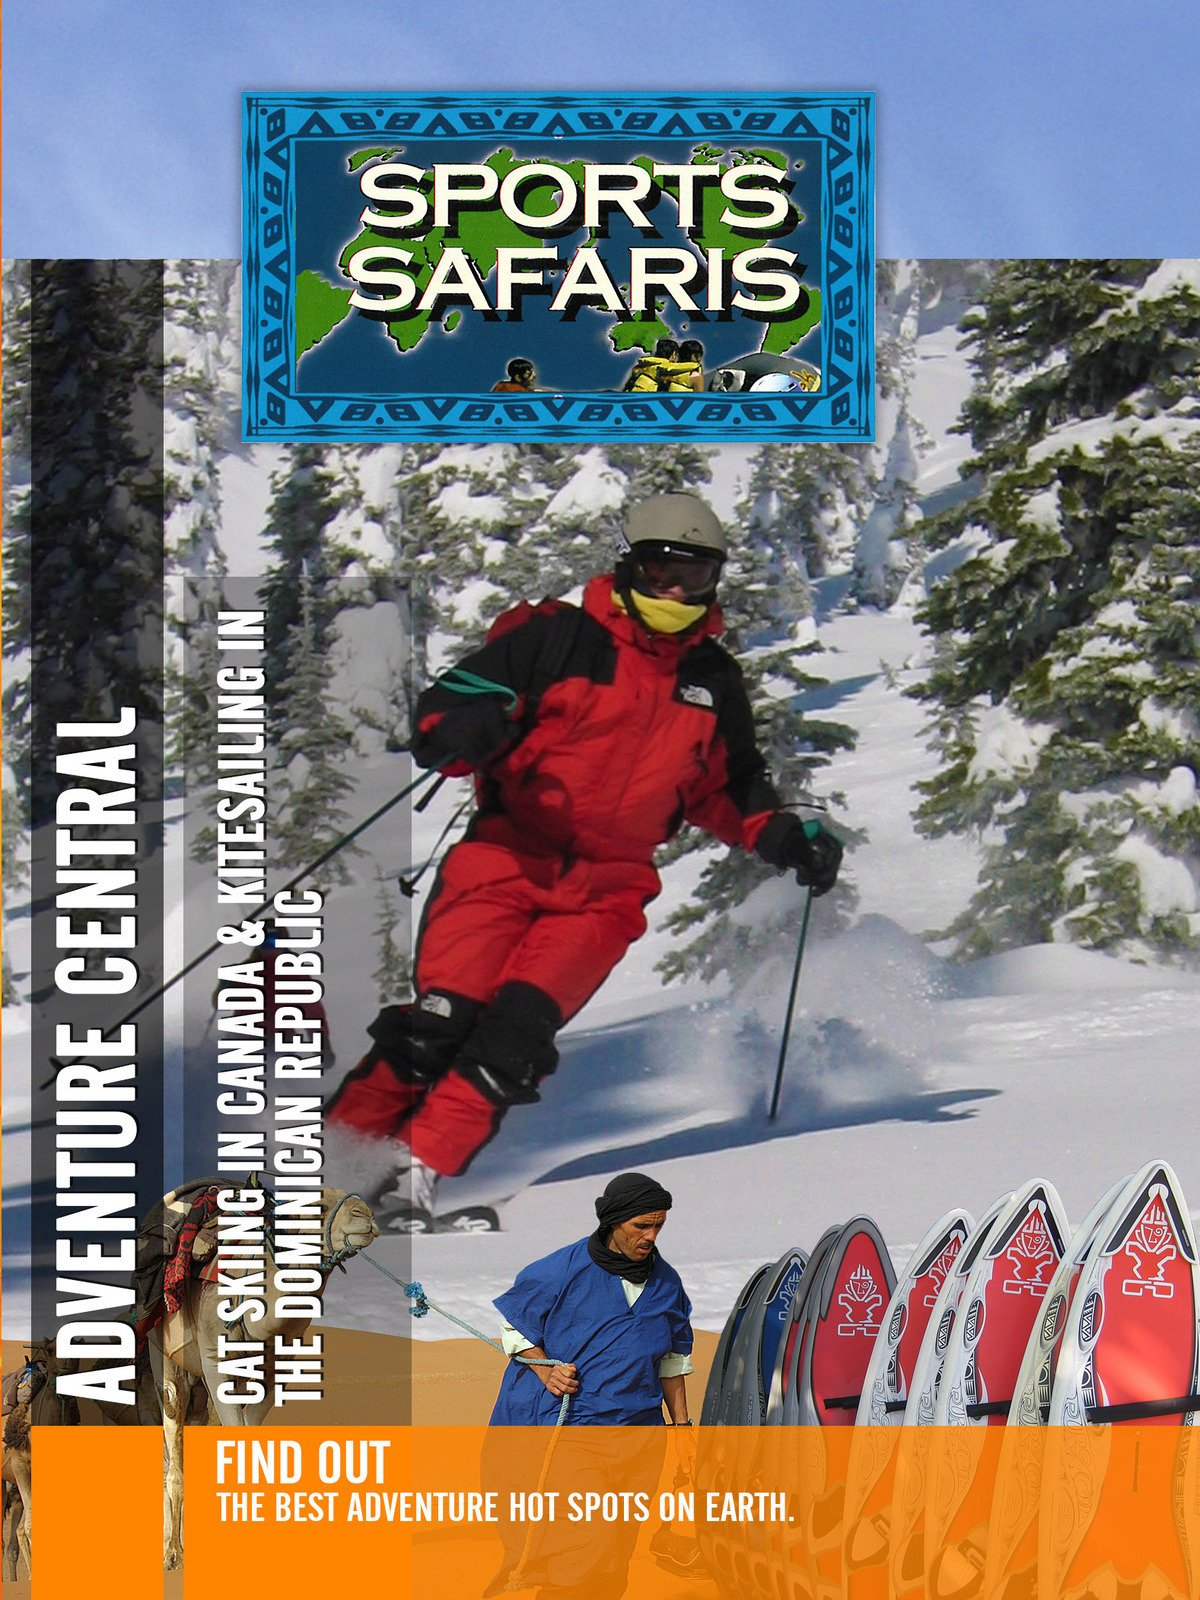 Sports Safaris - Adventure Central: Cat Skiing in Canada & Kitesailing in the Dominican Republic on Amazon Prime Video UK